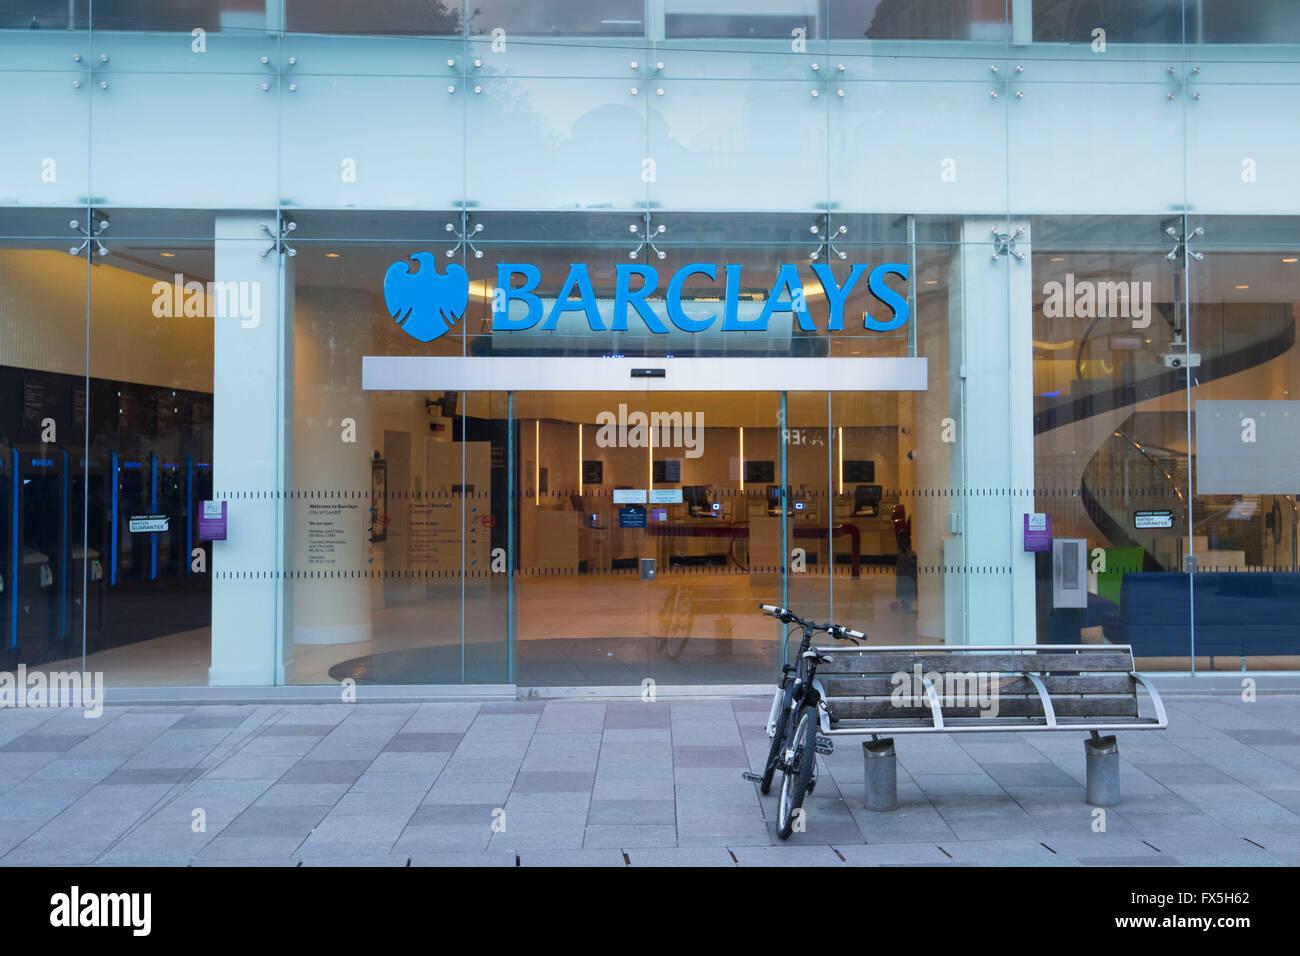 Barclays bank sign logo. - Stock Image